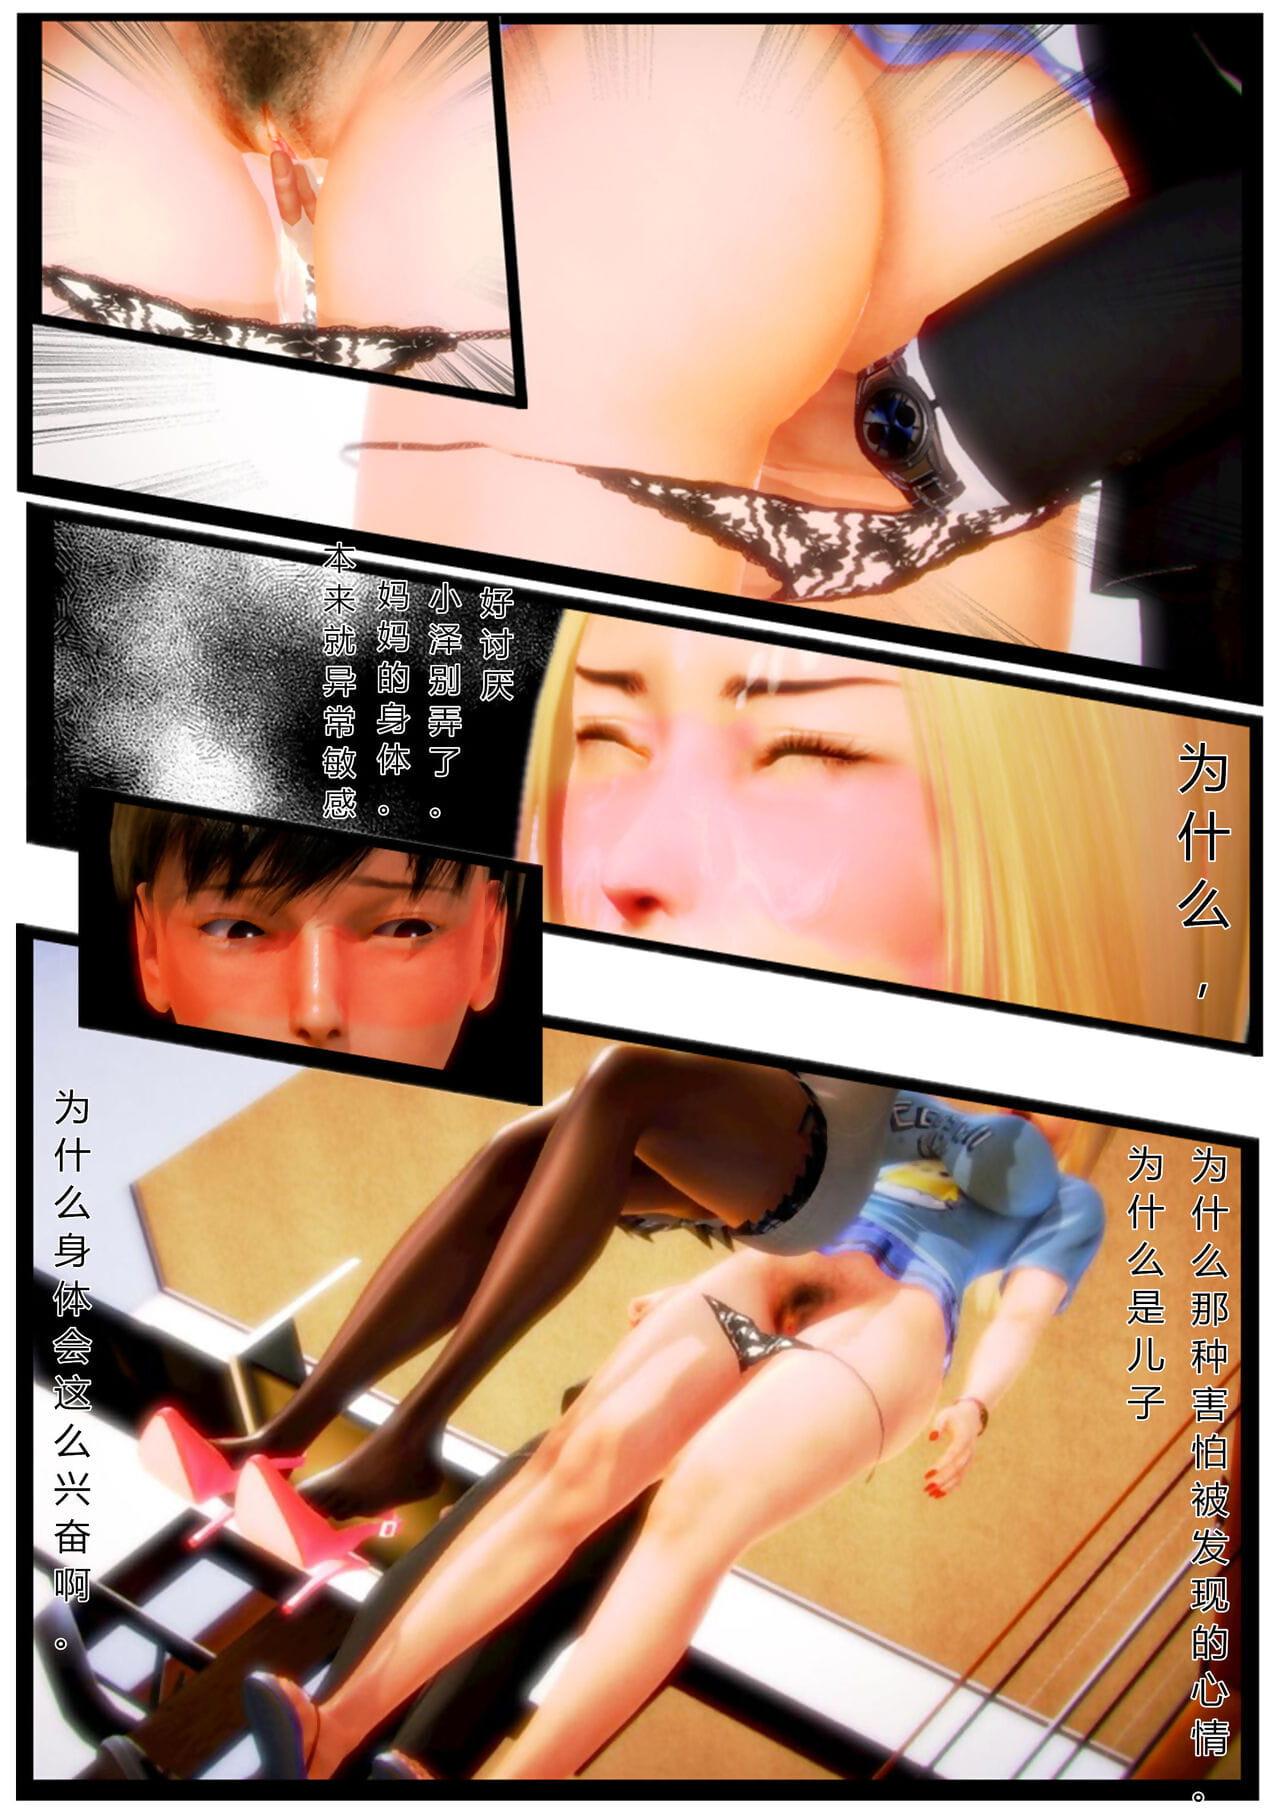 AA Daimaou 我的妈妈是妖狐(已经弃坑) Chinese - accoutrement 2